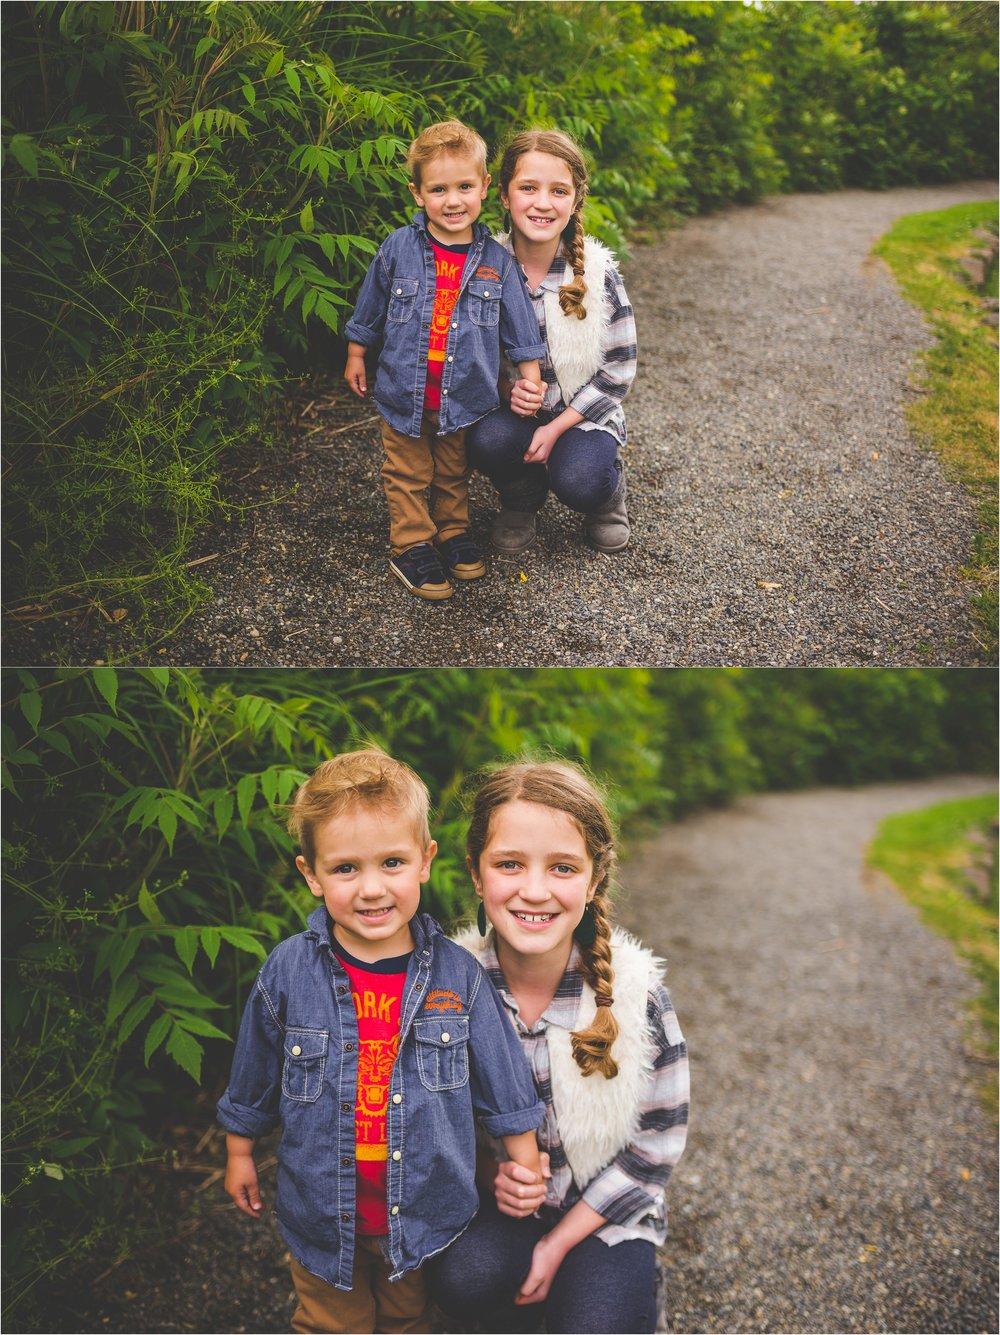 jannicka-mayte-tacoma-olympia-seattle-family-photographer_0007.jpg